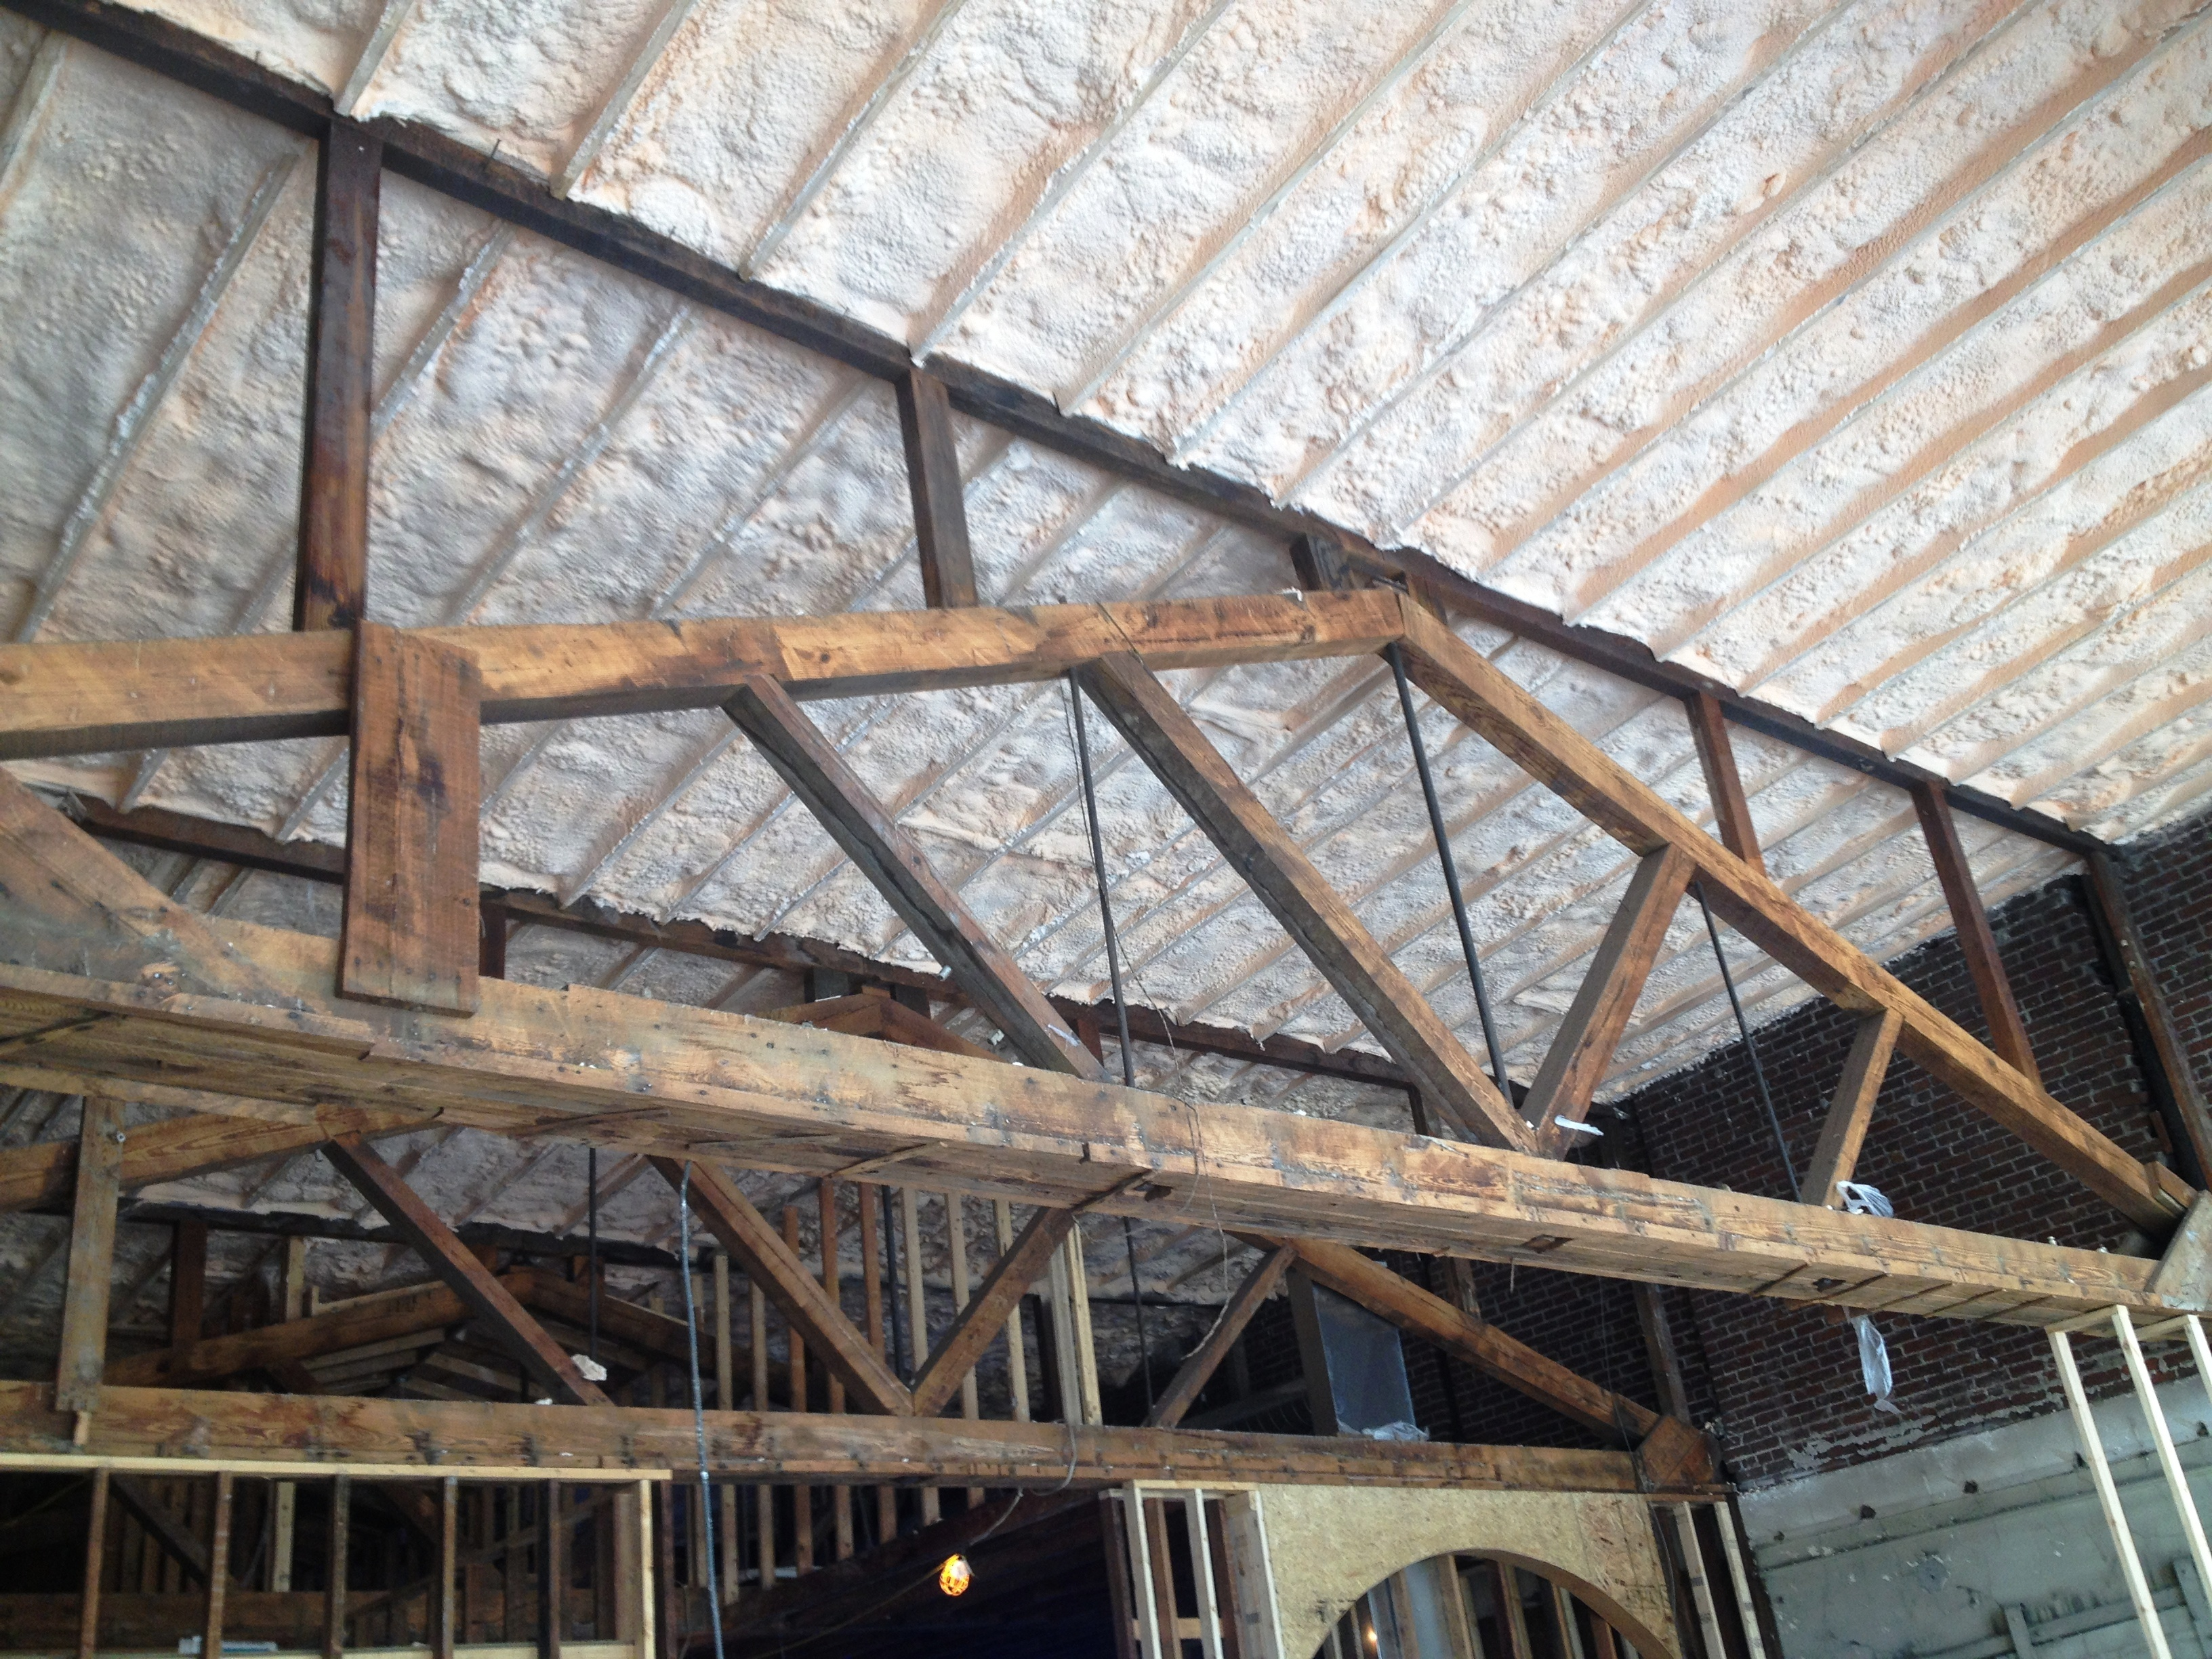 Ceiling insulation spray foam benefits